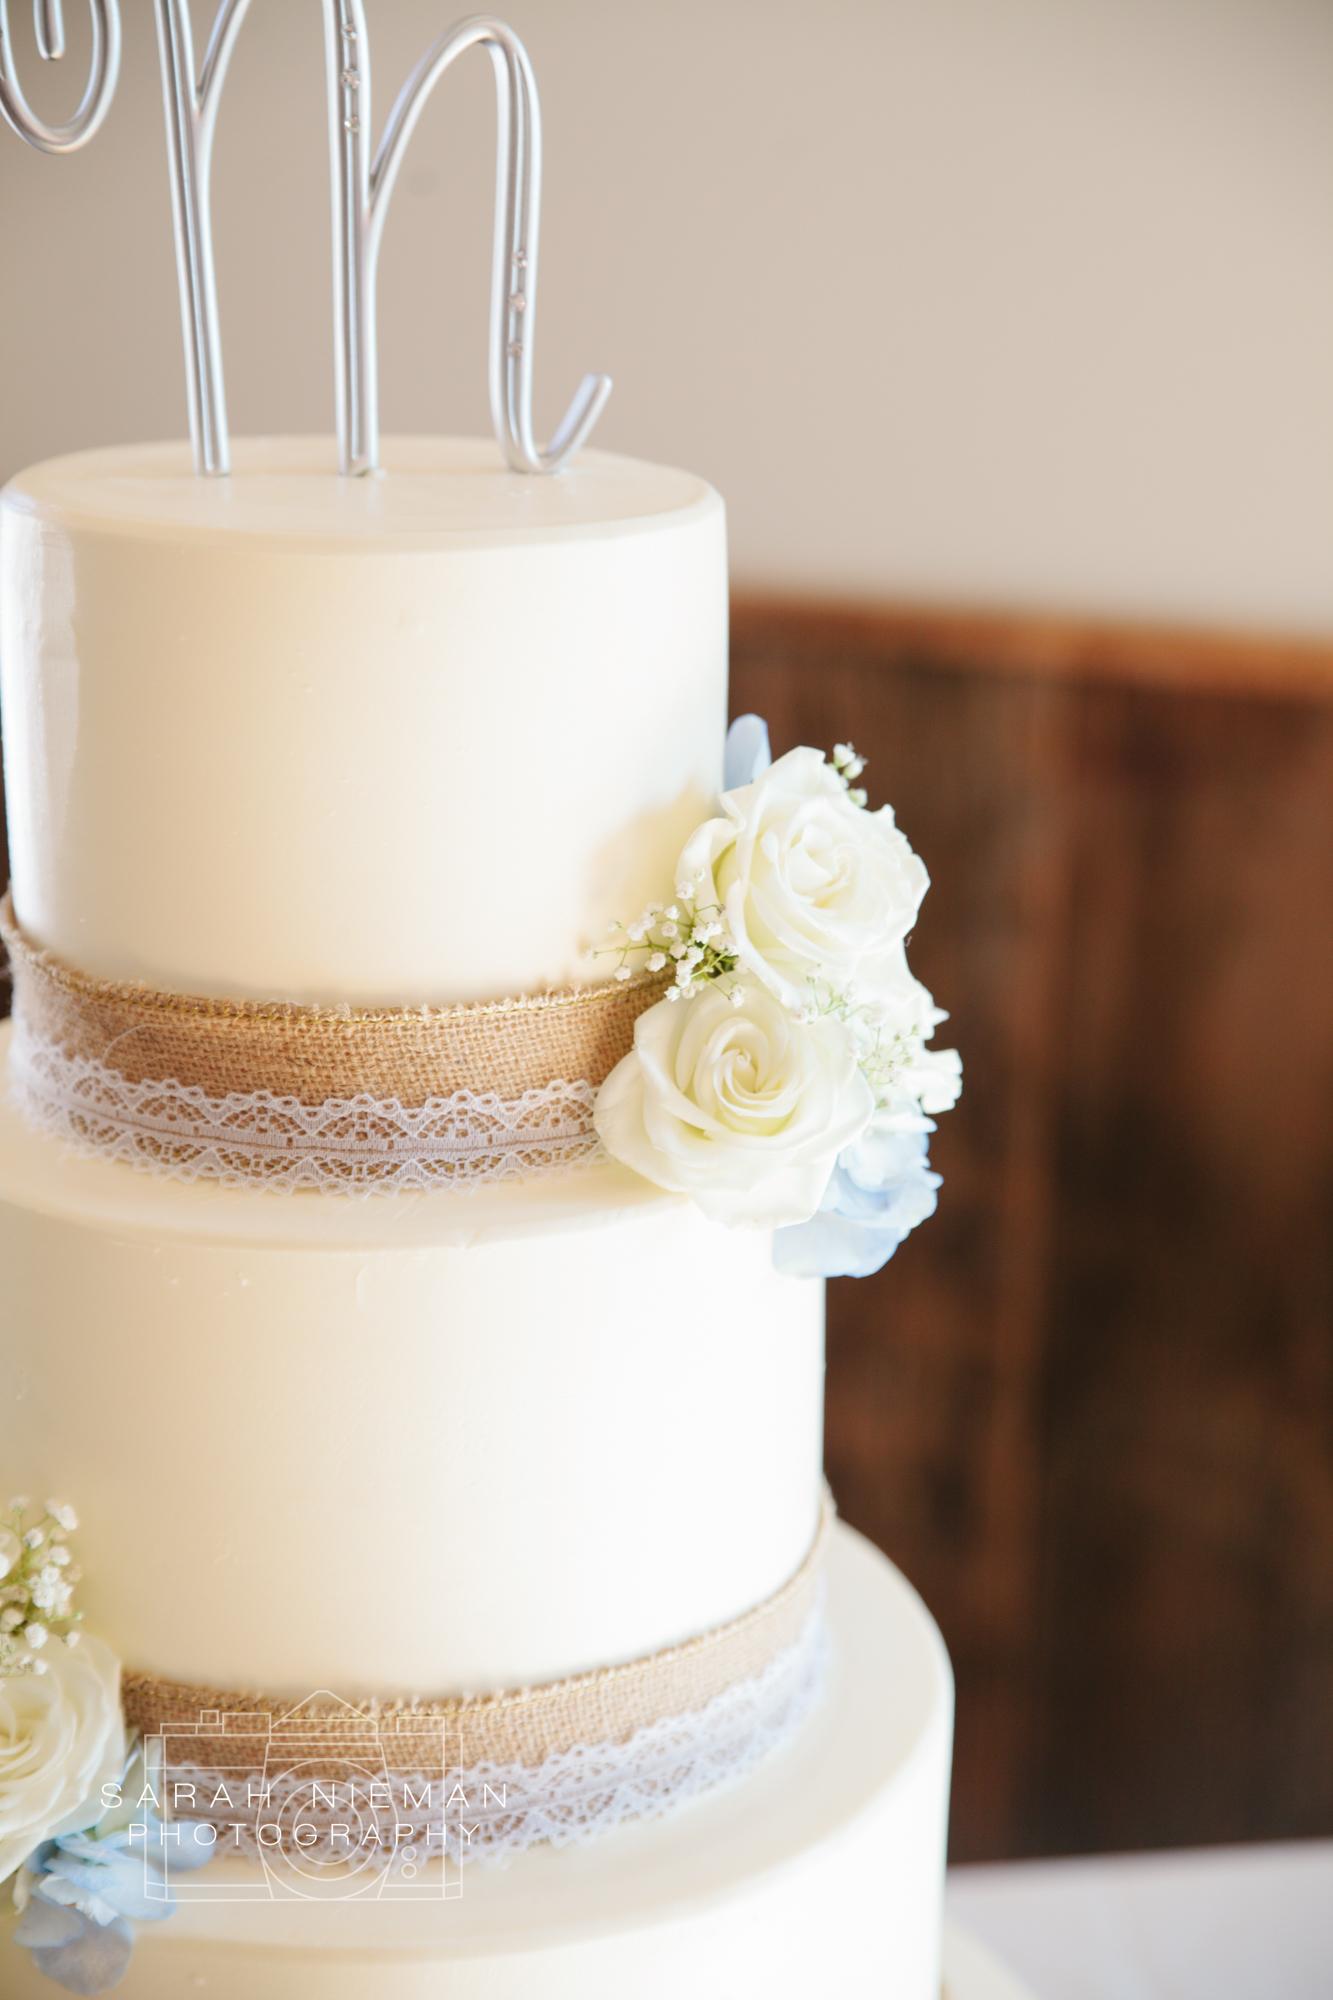 Simple cakes make me happy. Isn't it gorgeous!?